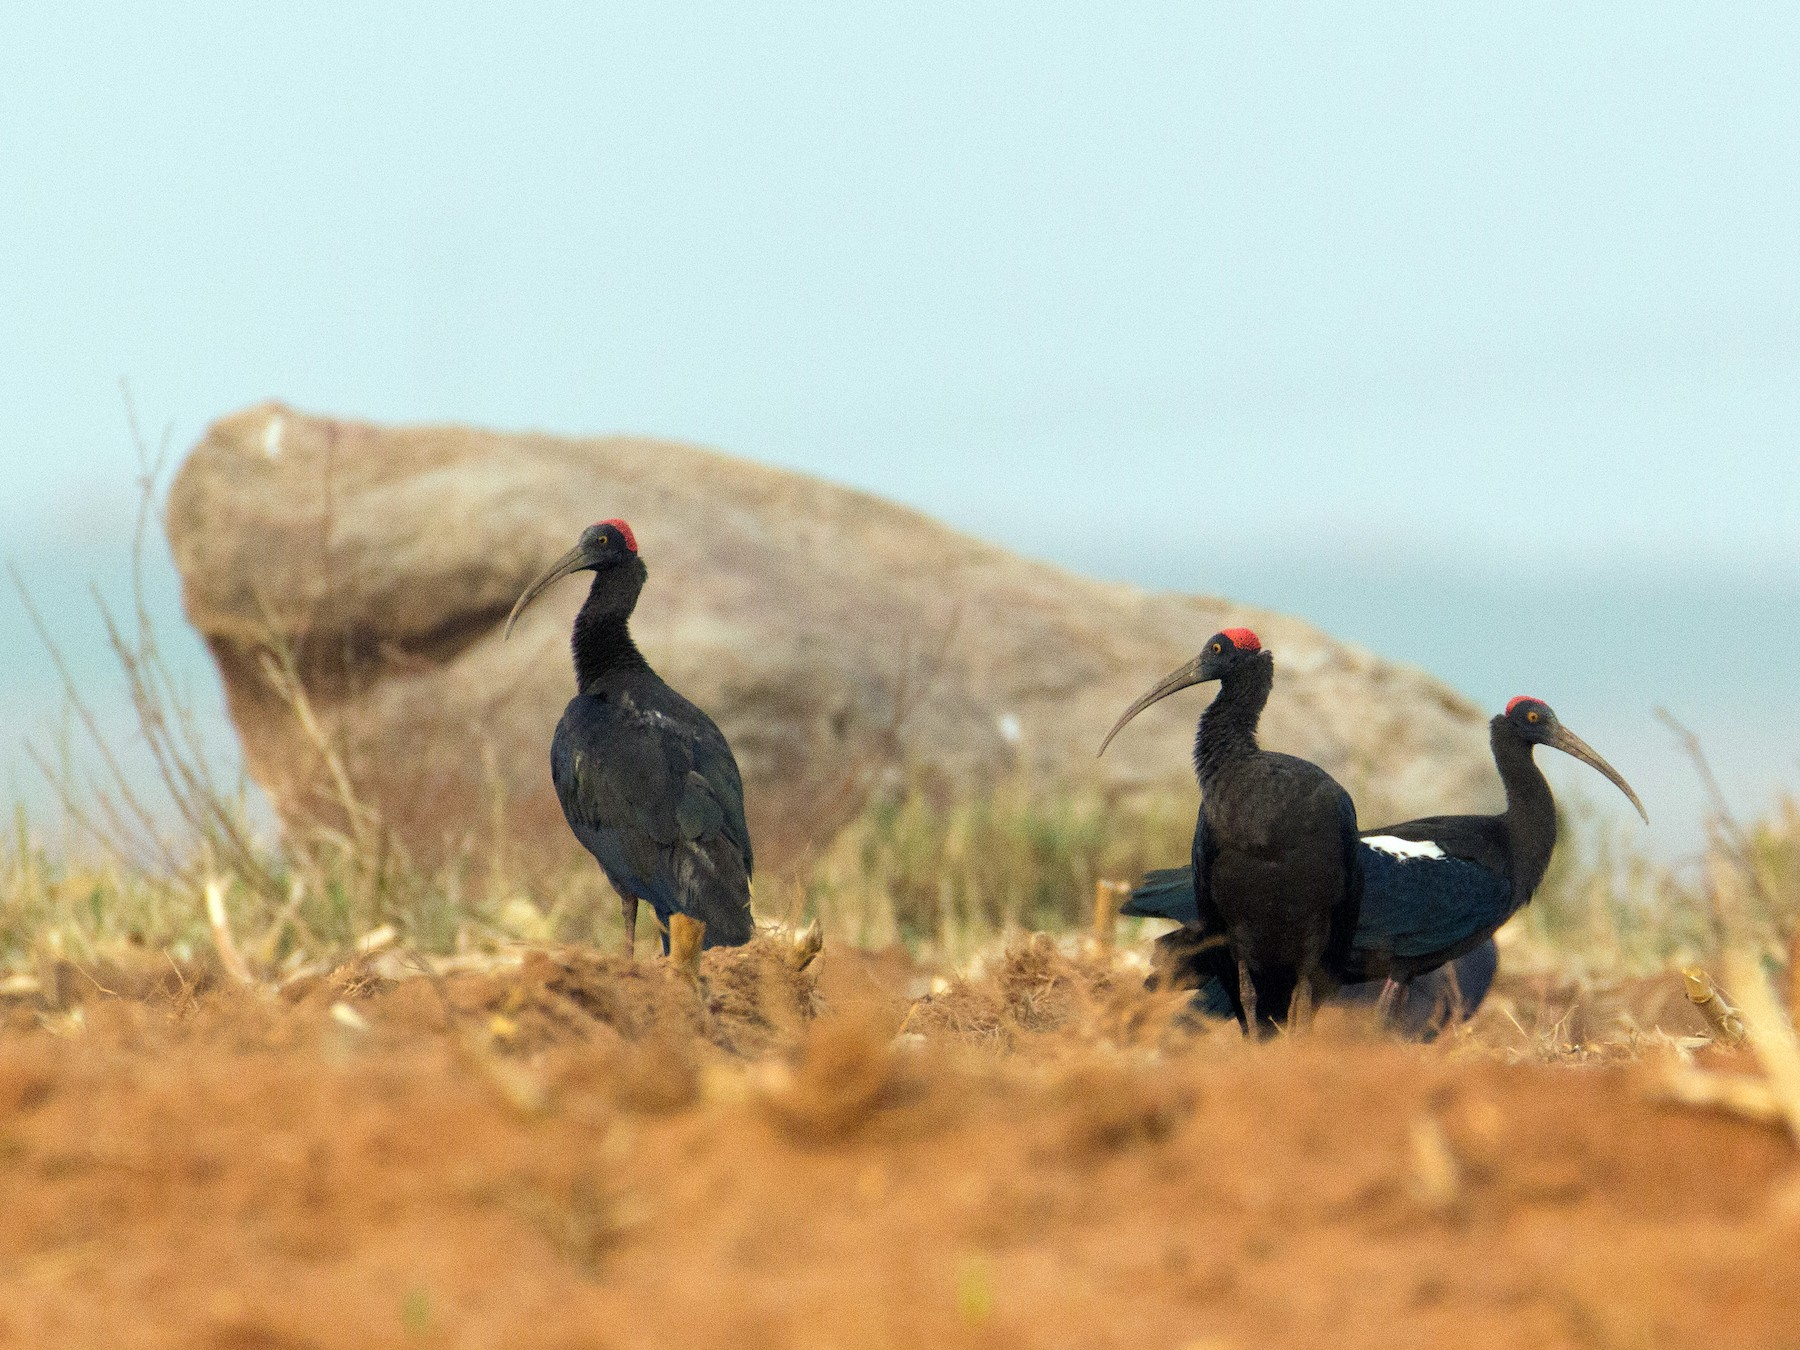 Red-naped Ibis - Adithya Bhat